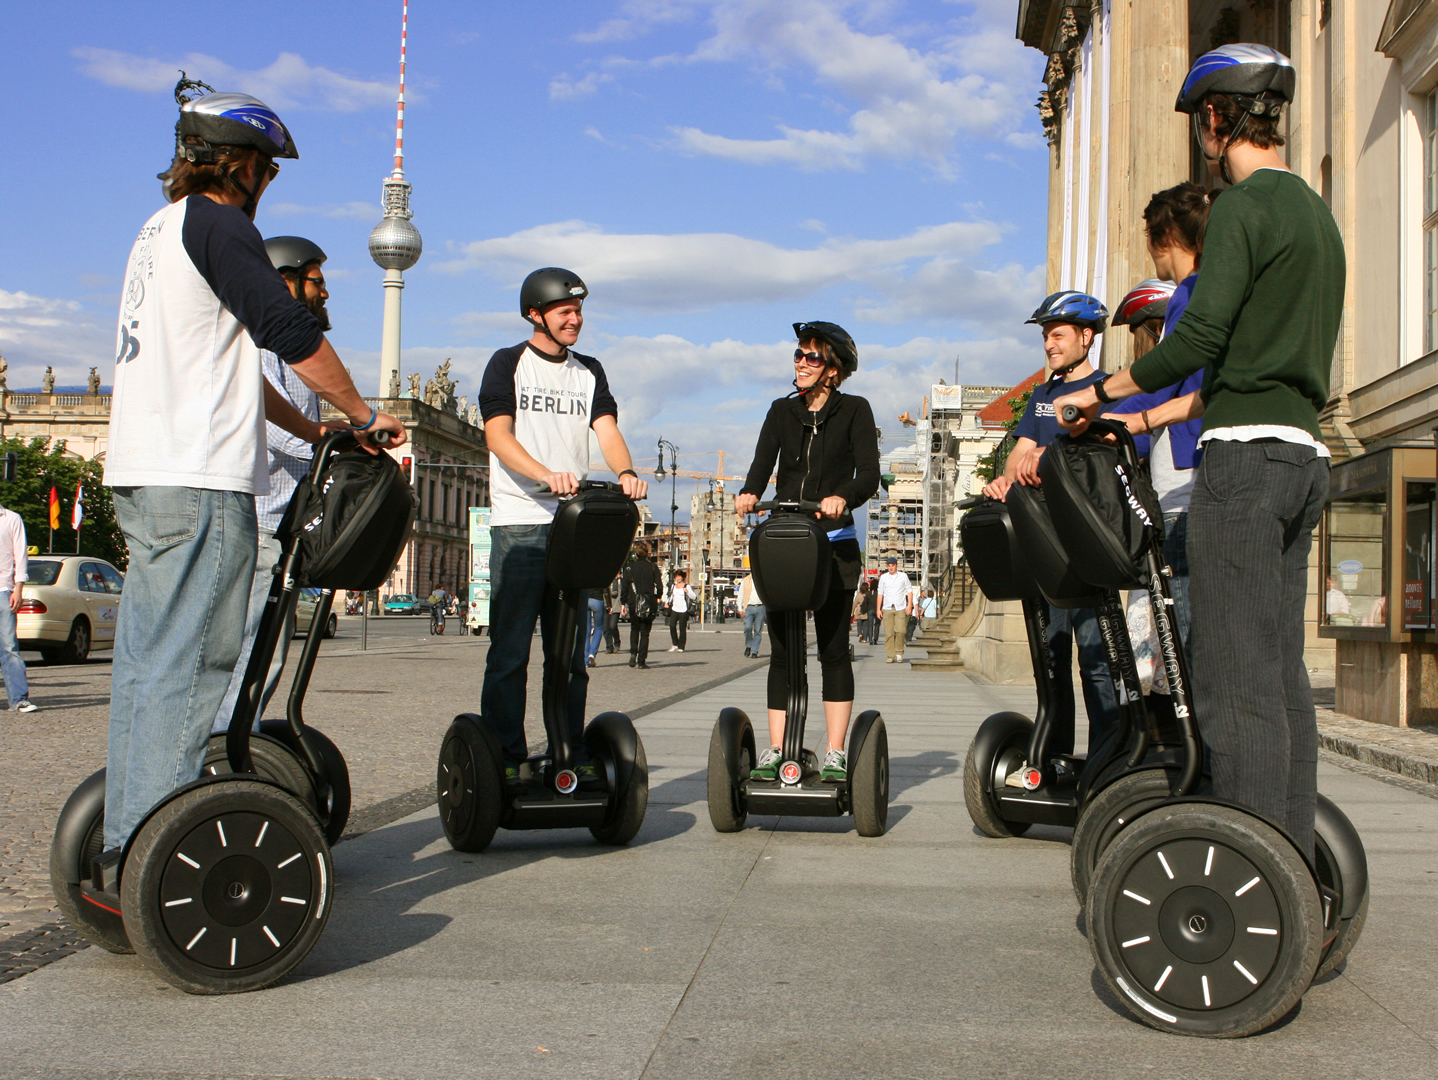 Fat Tire Tours Berlin